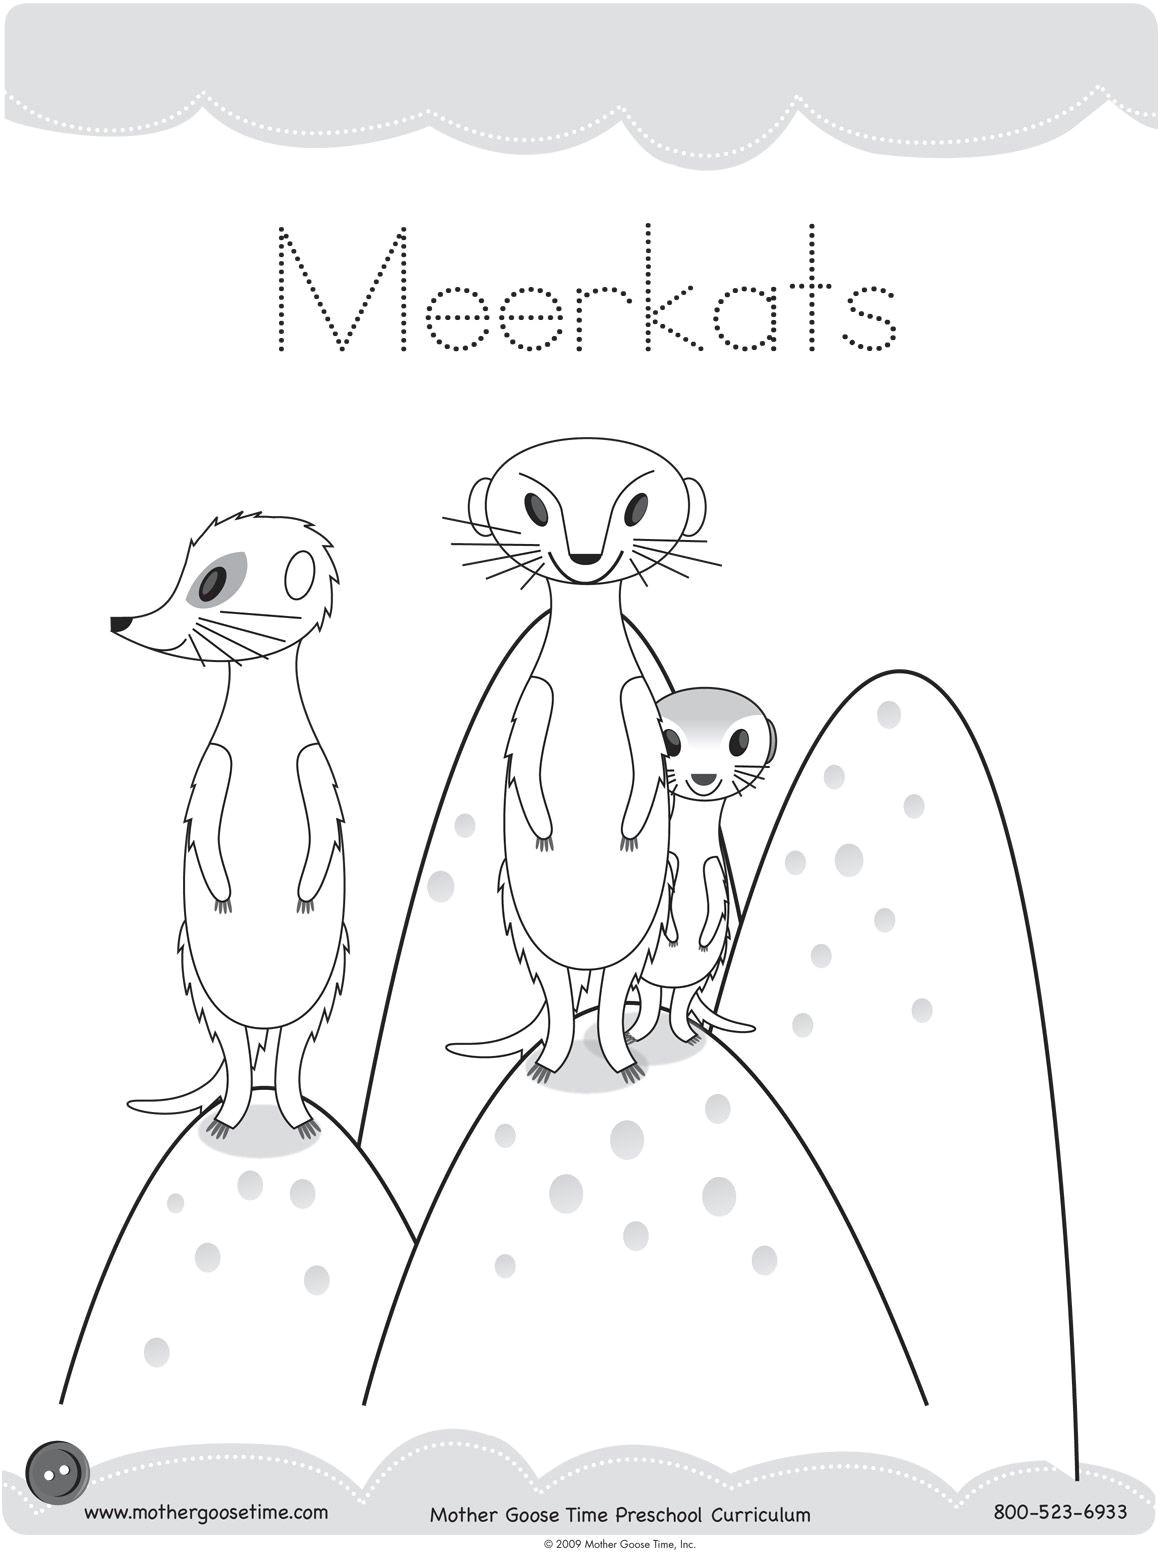 Meerkat Drawing Easy Image Result for Meerkat Drawing Kids Erdmannchen